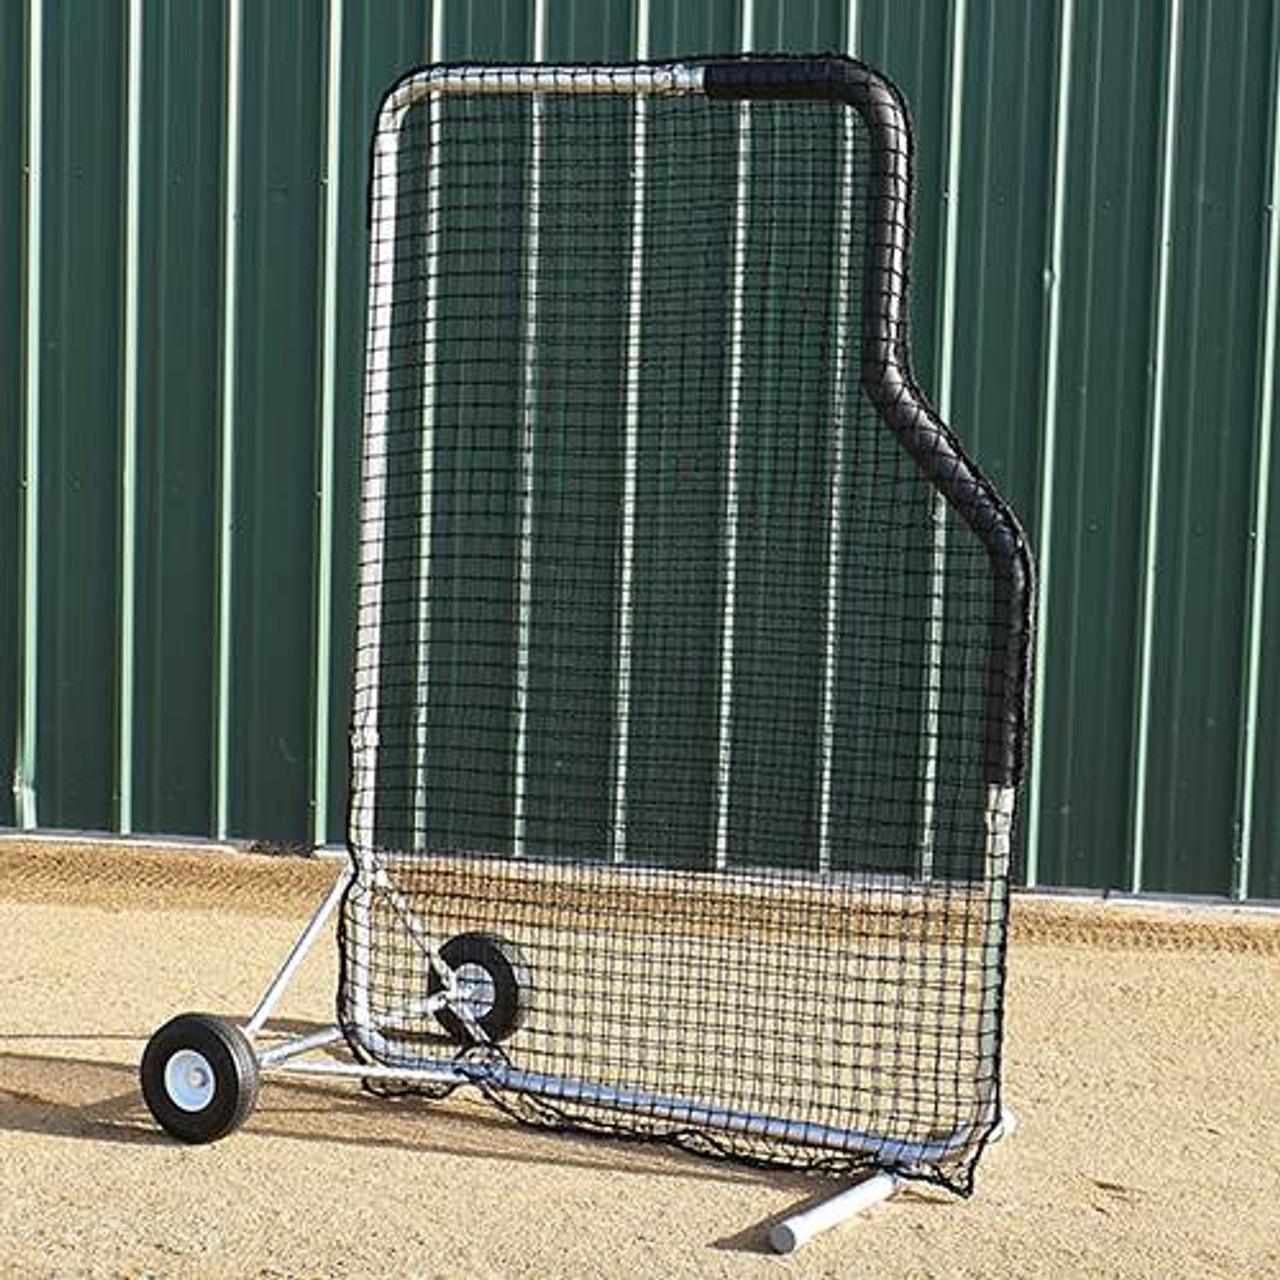 Baseball Protector Mini L Screen Replacement Net